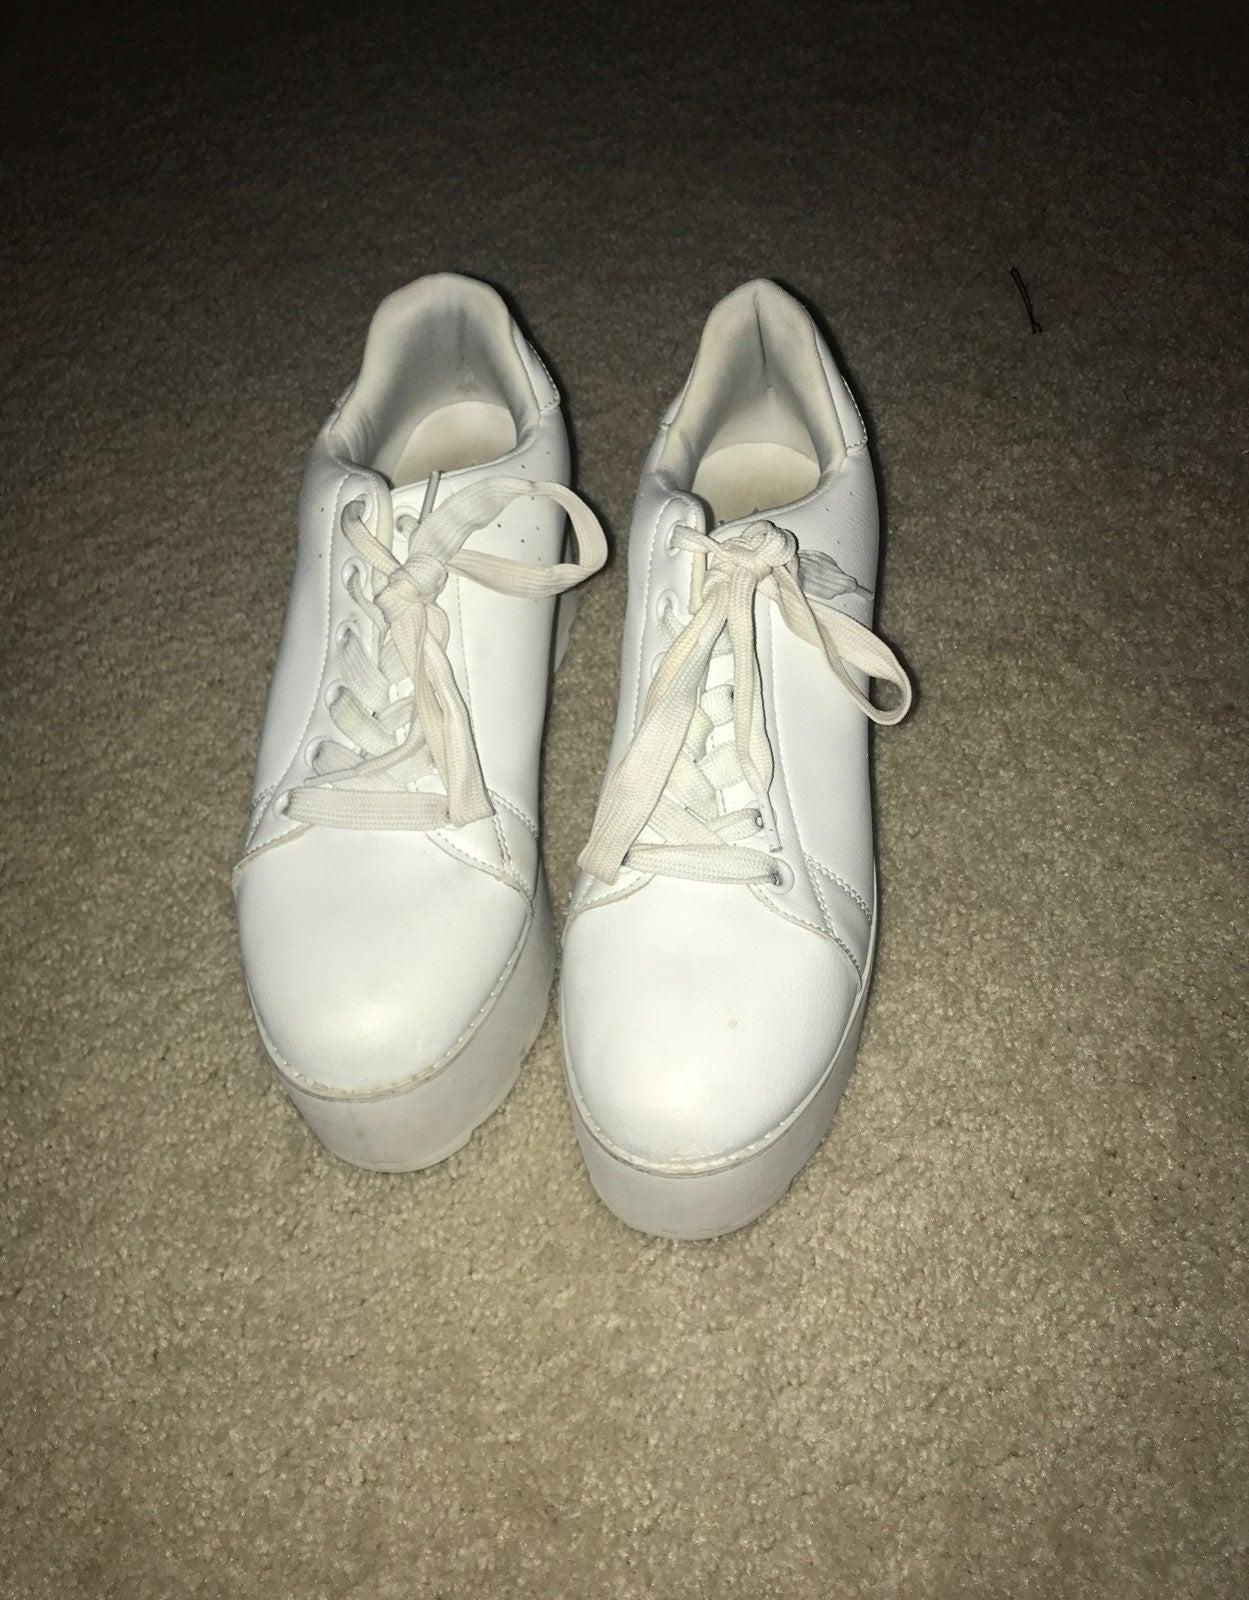 angelic lala platform sneakers